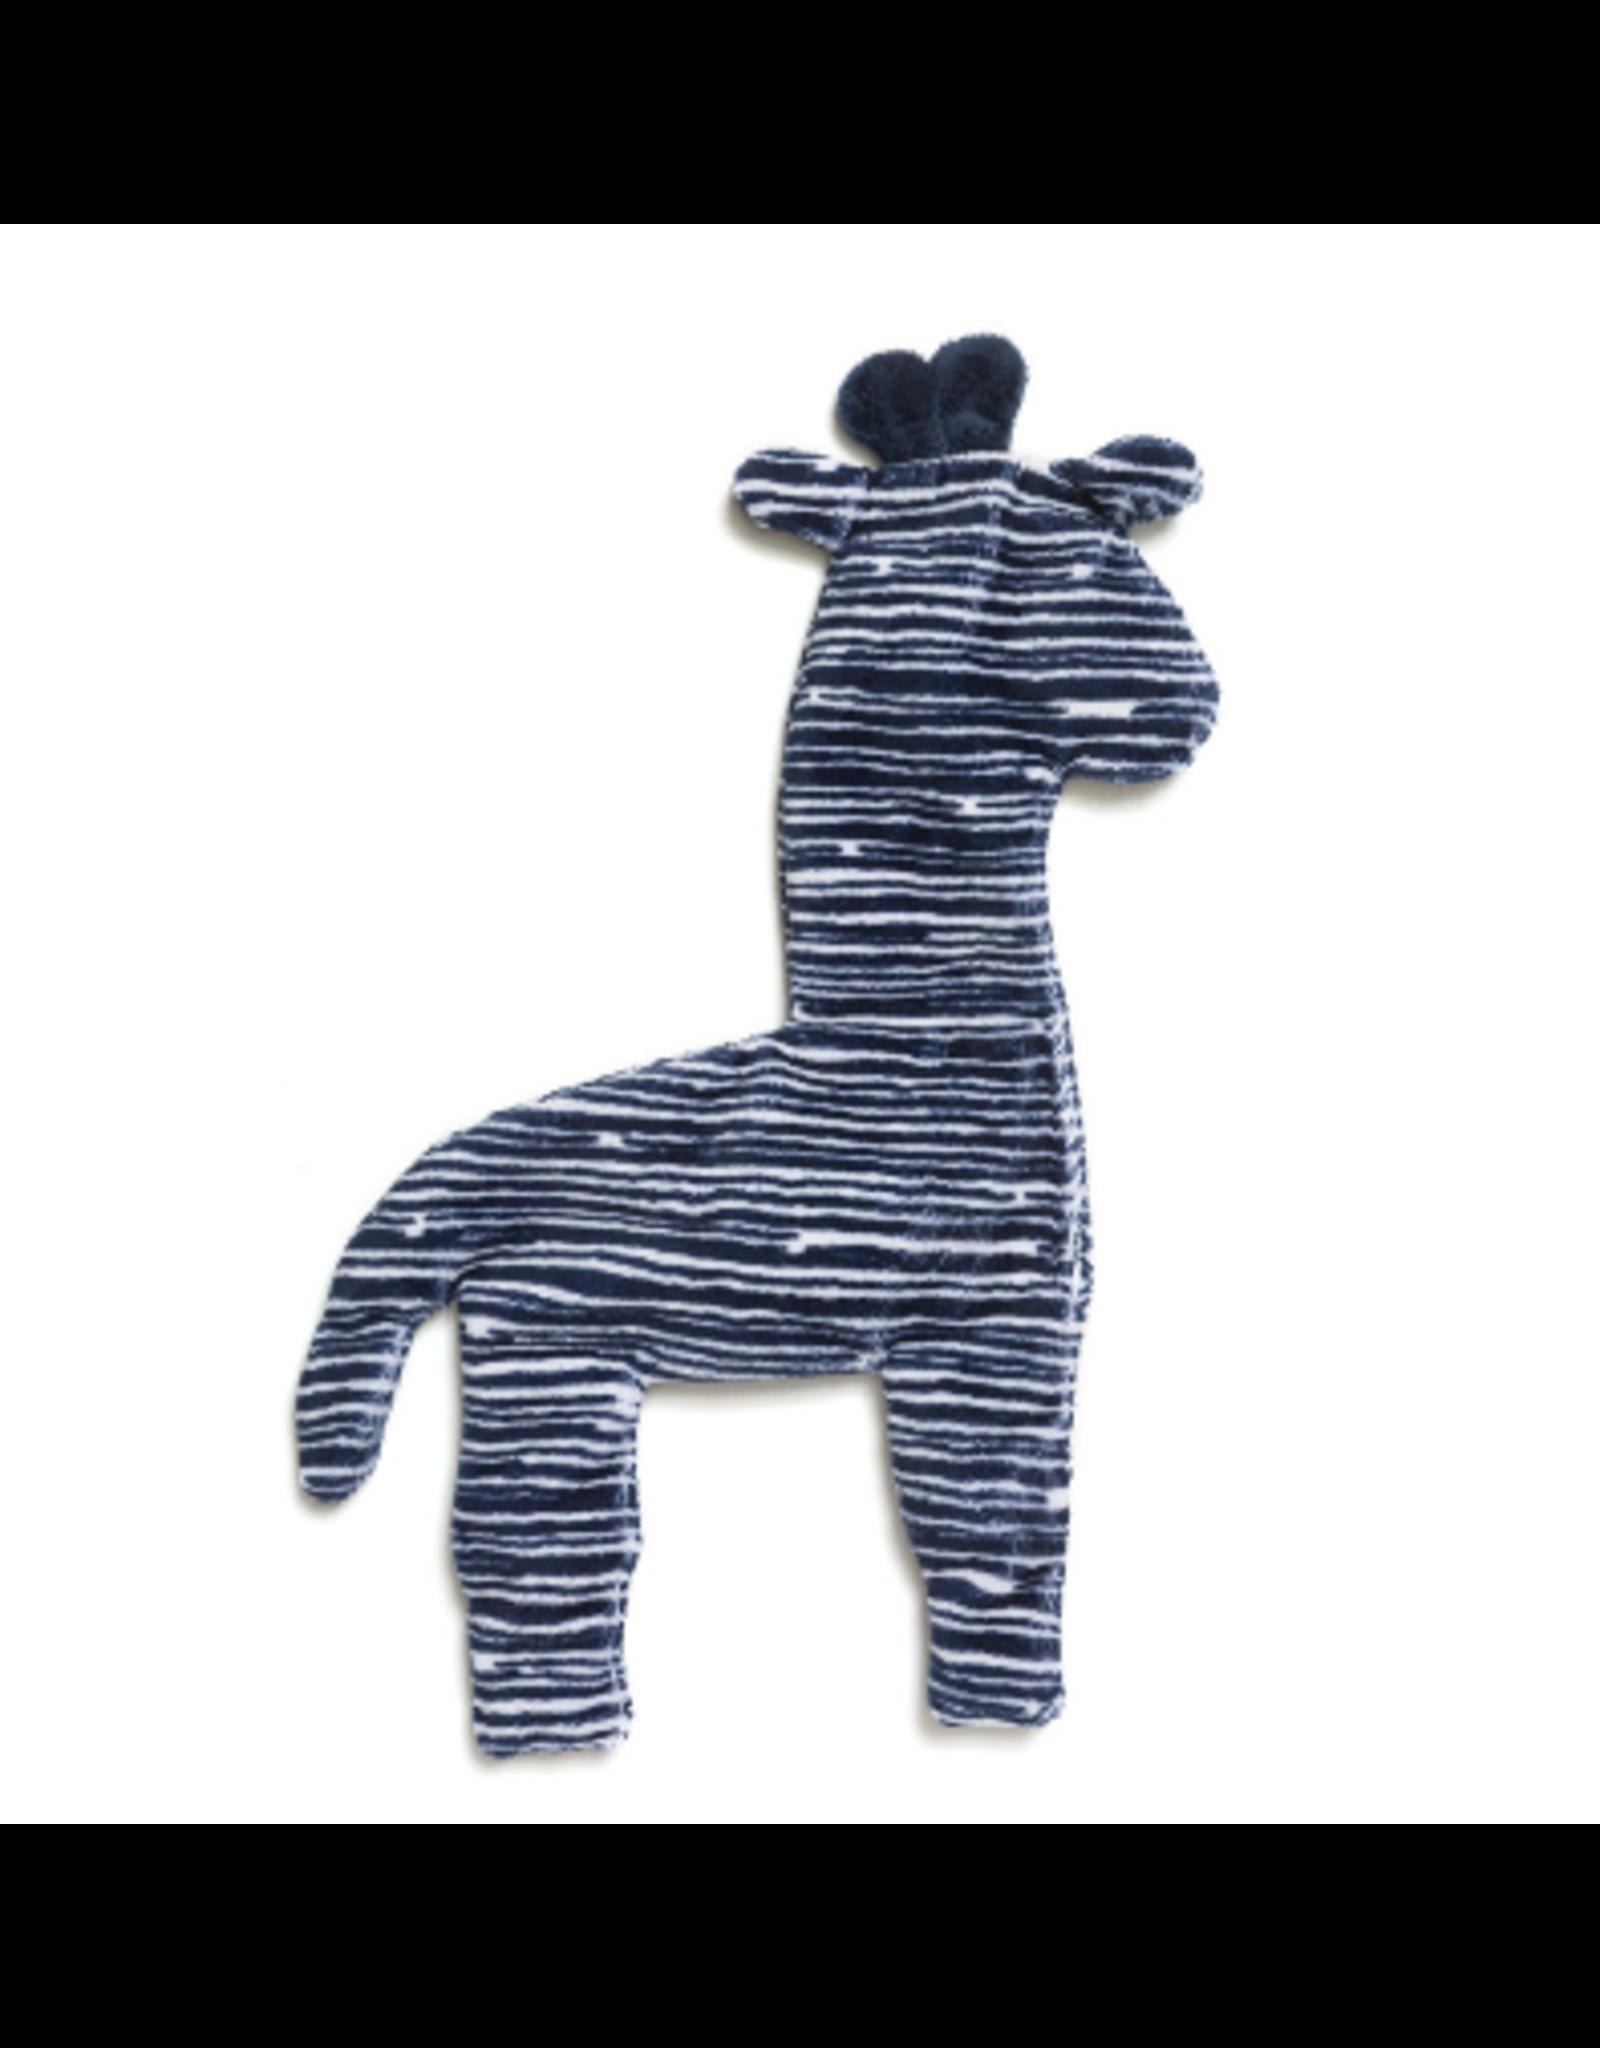 West Paw Designs Westpaw: Floppy Giraffe - Large  Navy Stripe